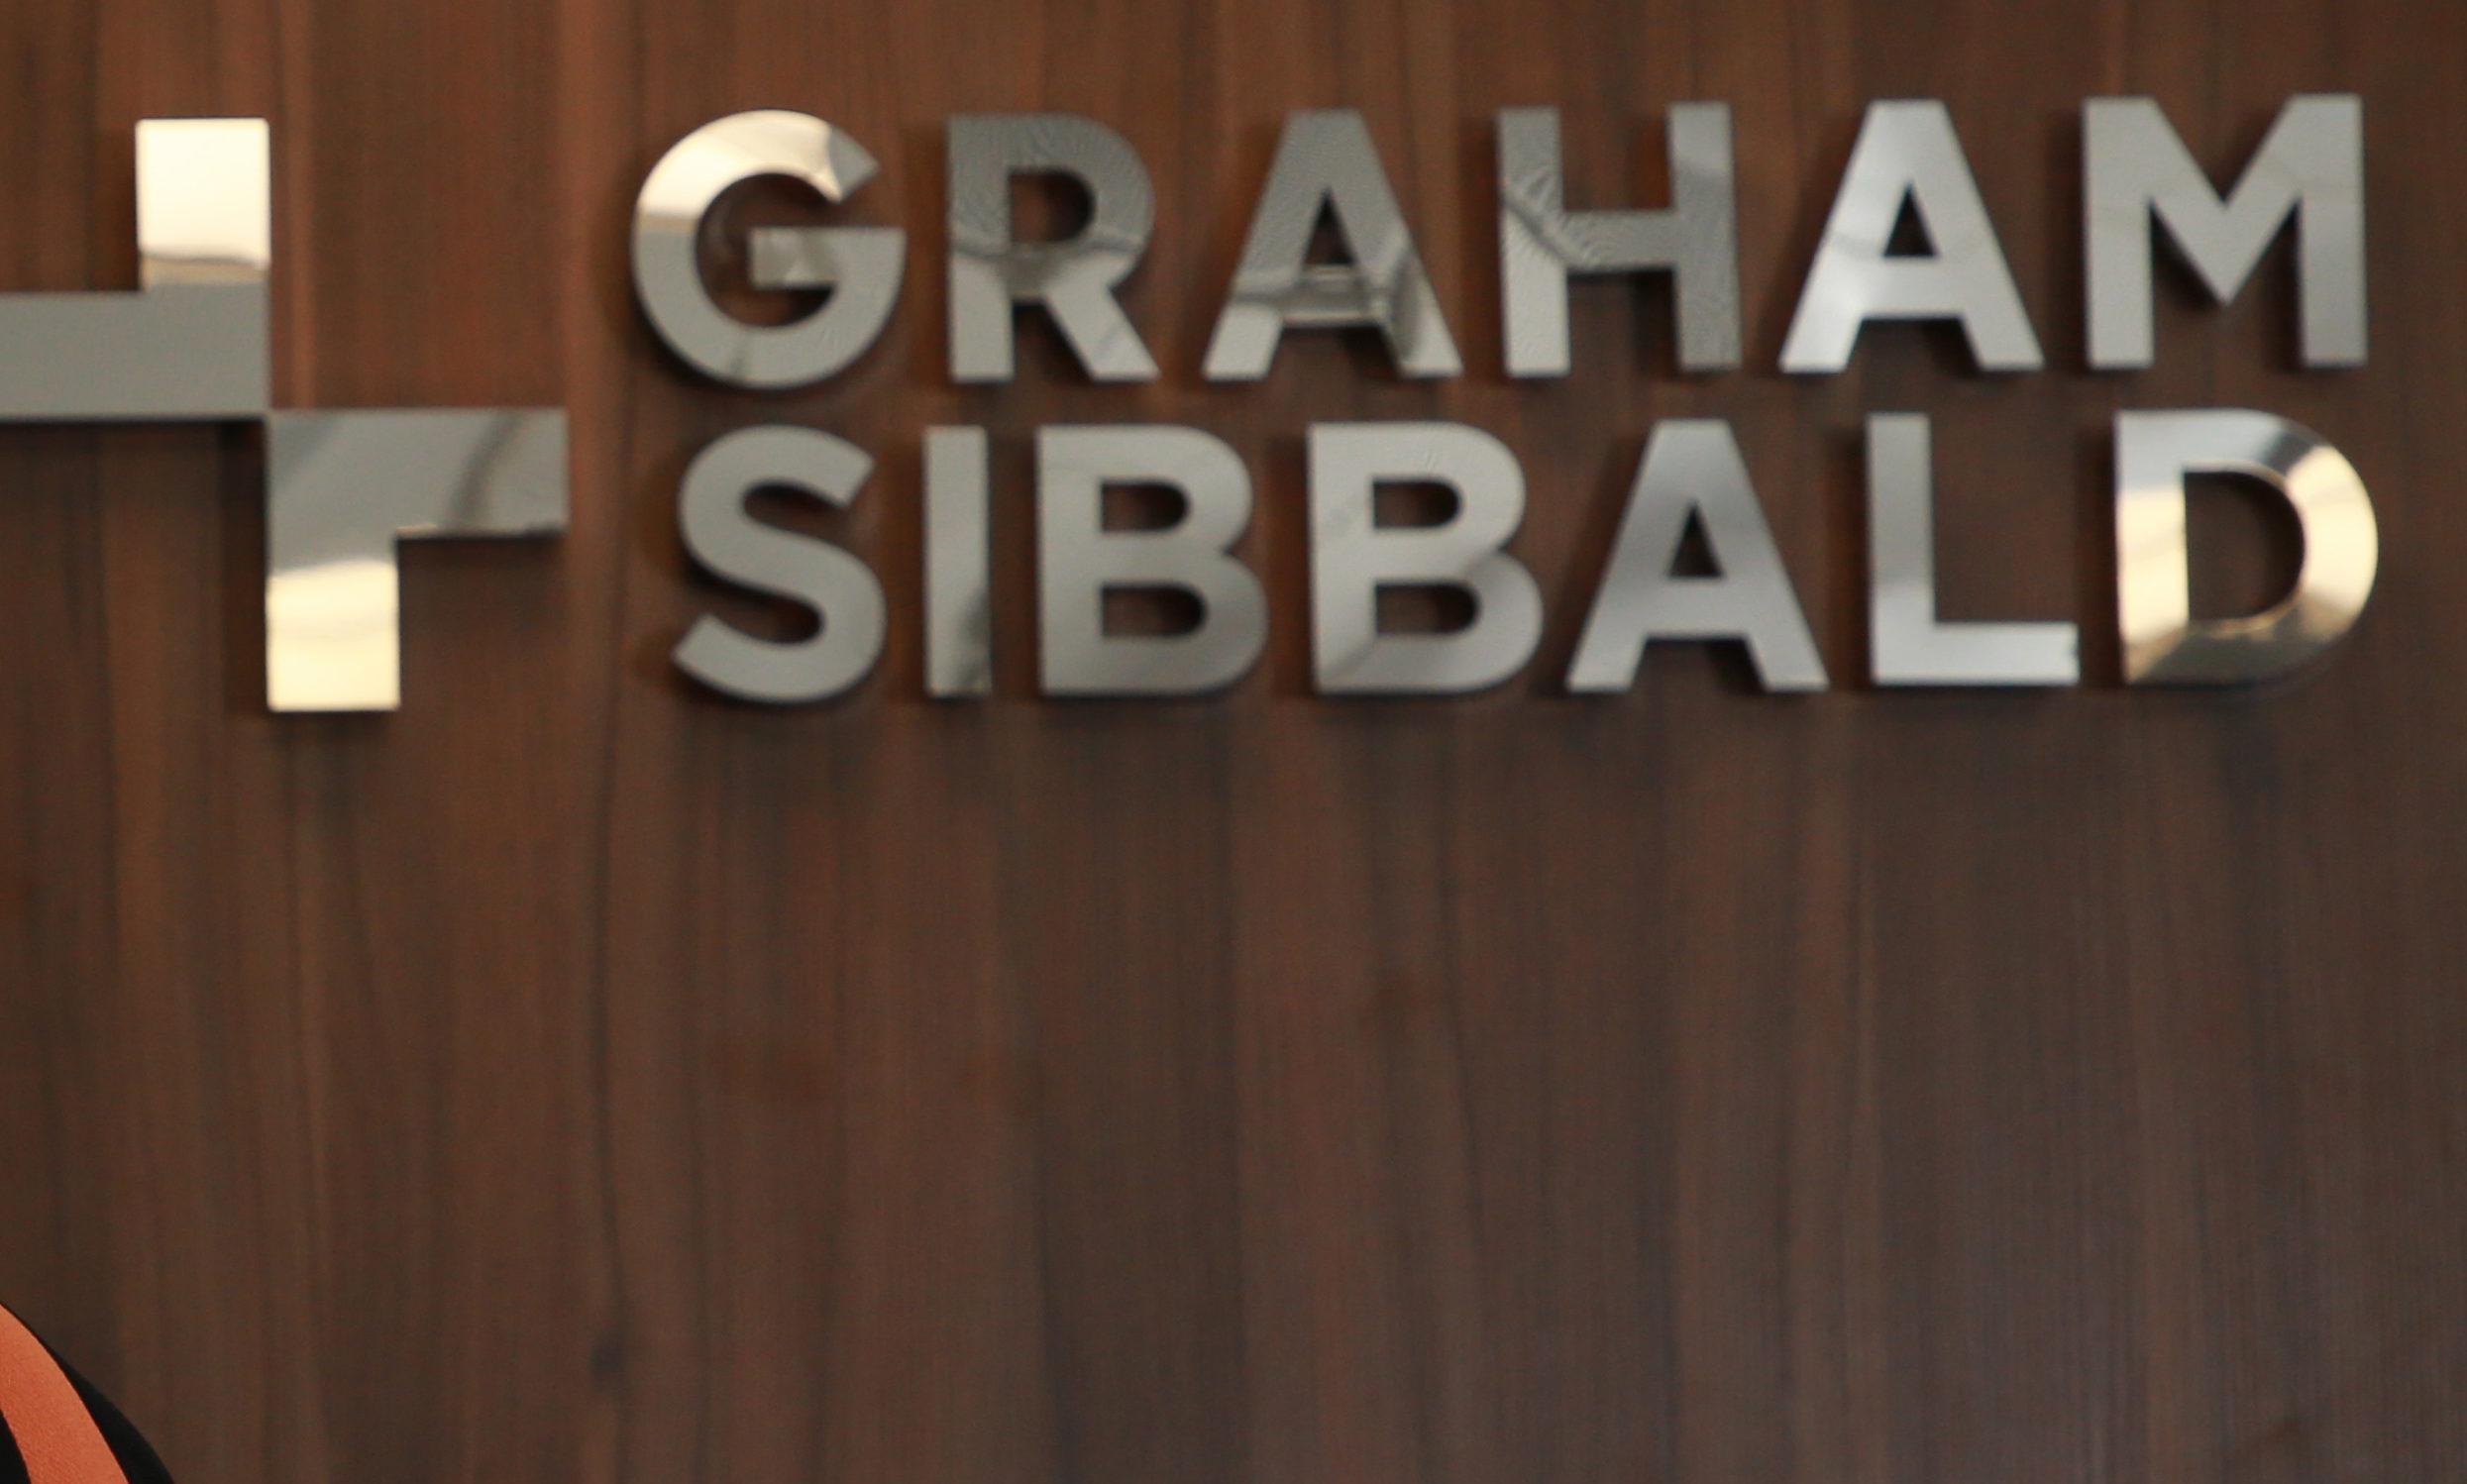 Graham and Sibbald